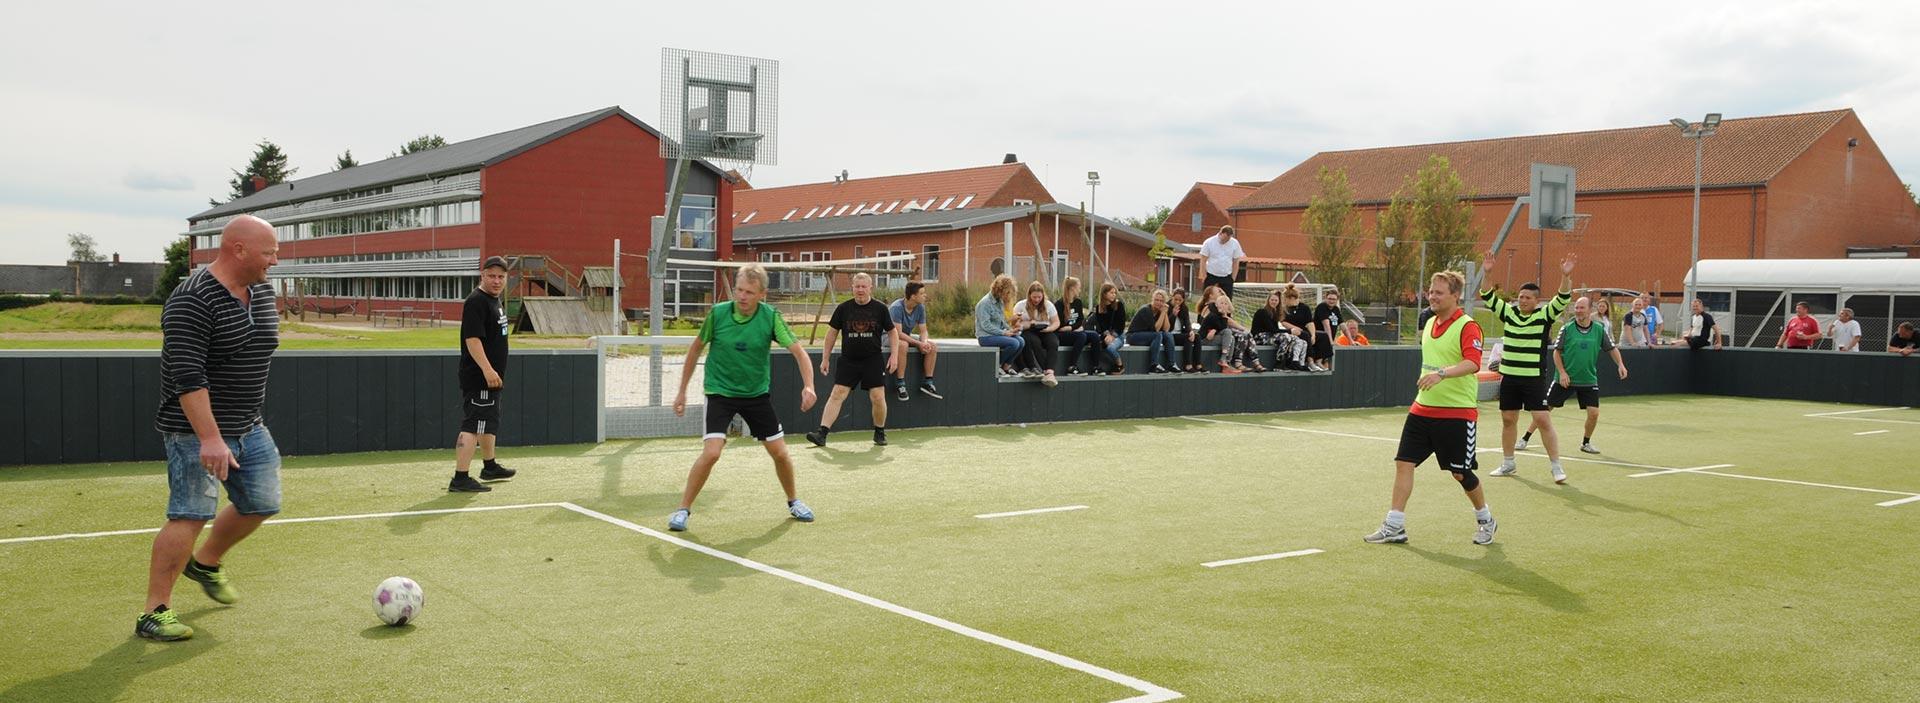 fodbold-turnering_1920x700